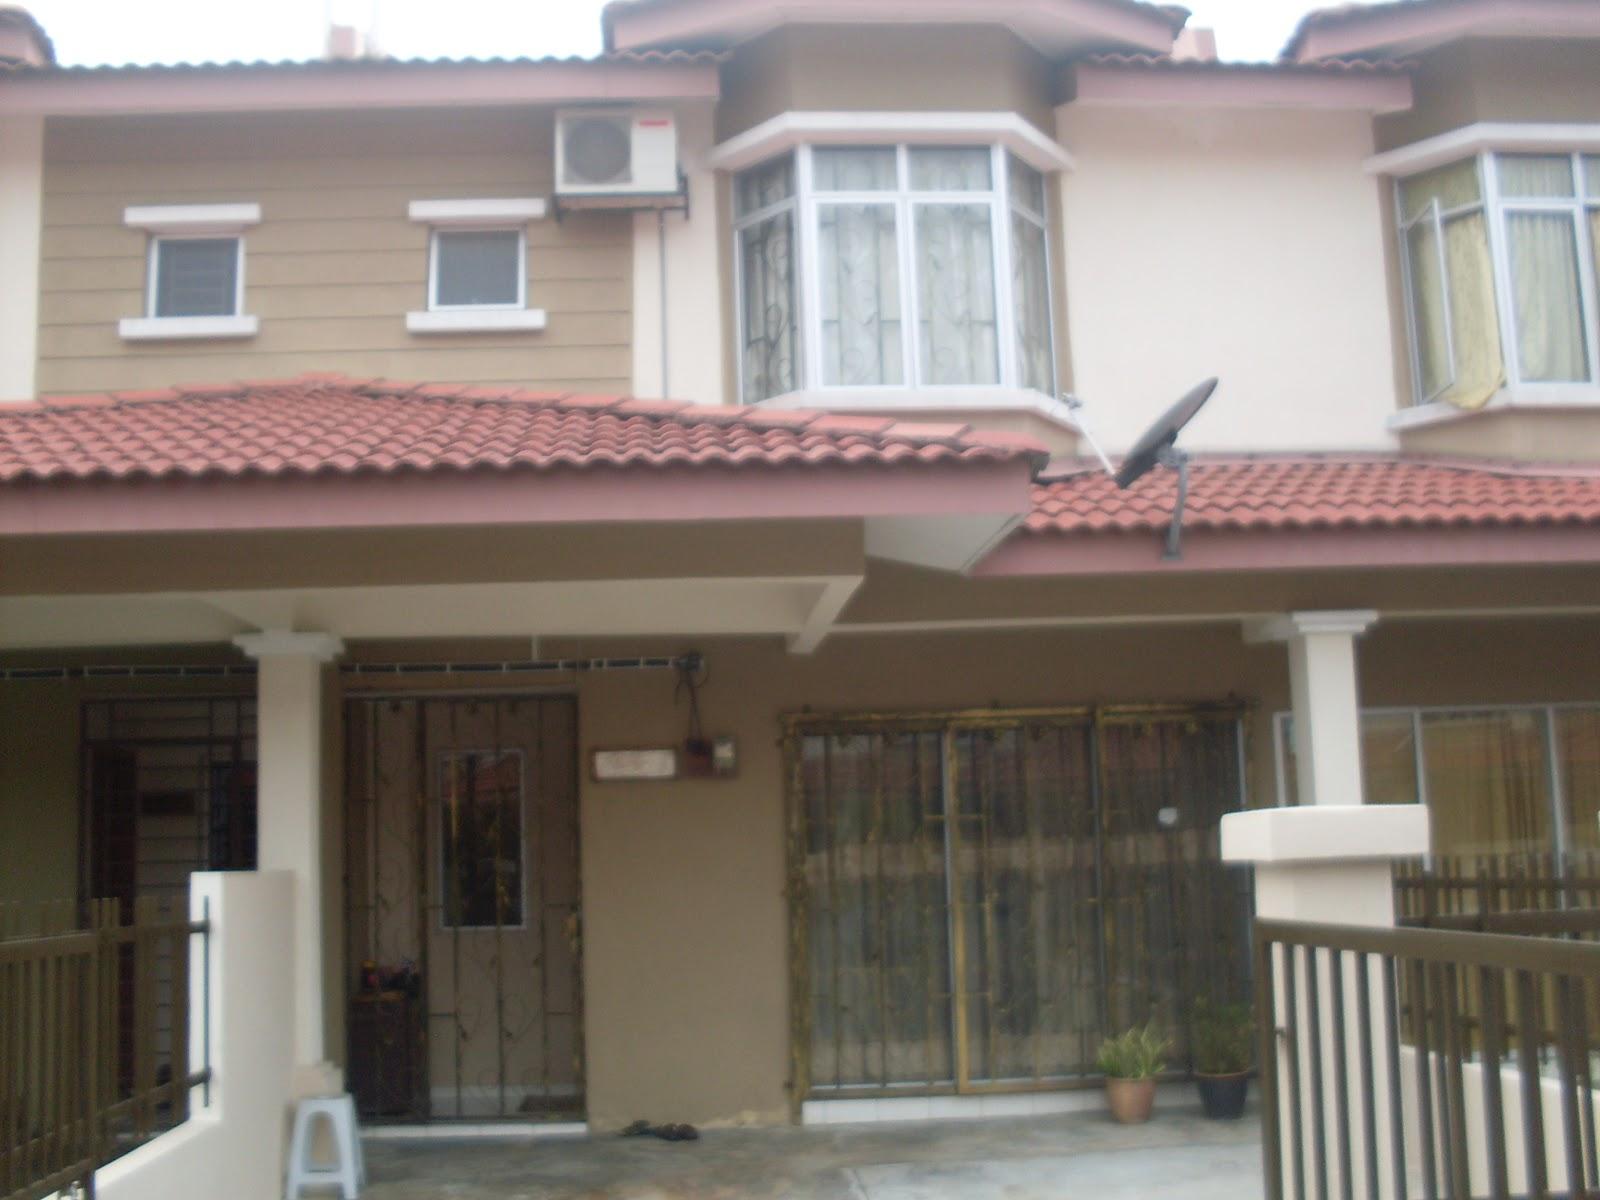 rumah pertama kamipejam celik dah tahun ke-5 kami tinggal di sini